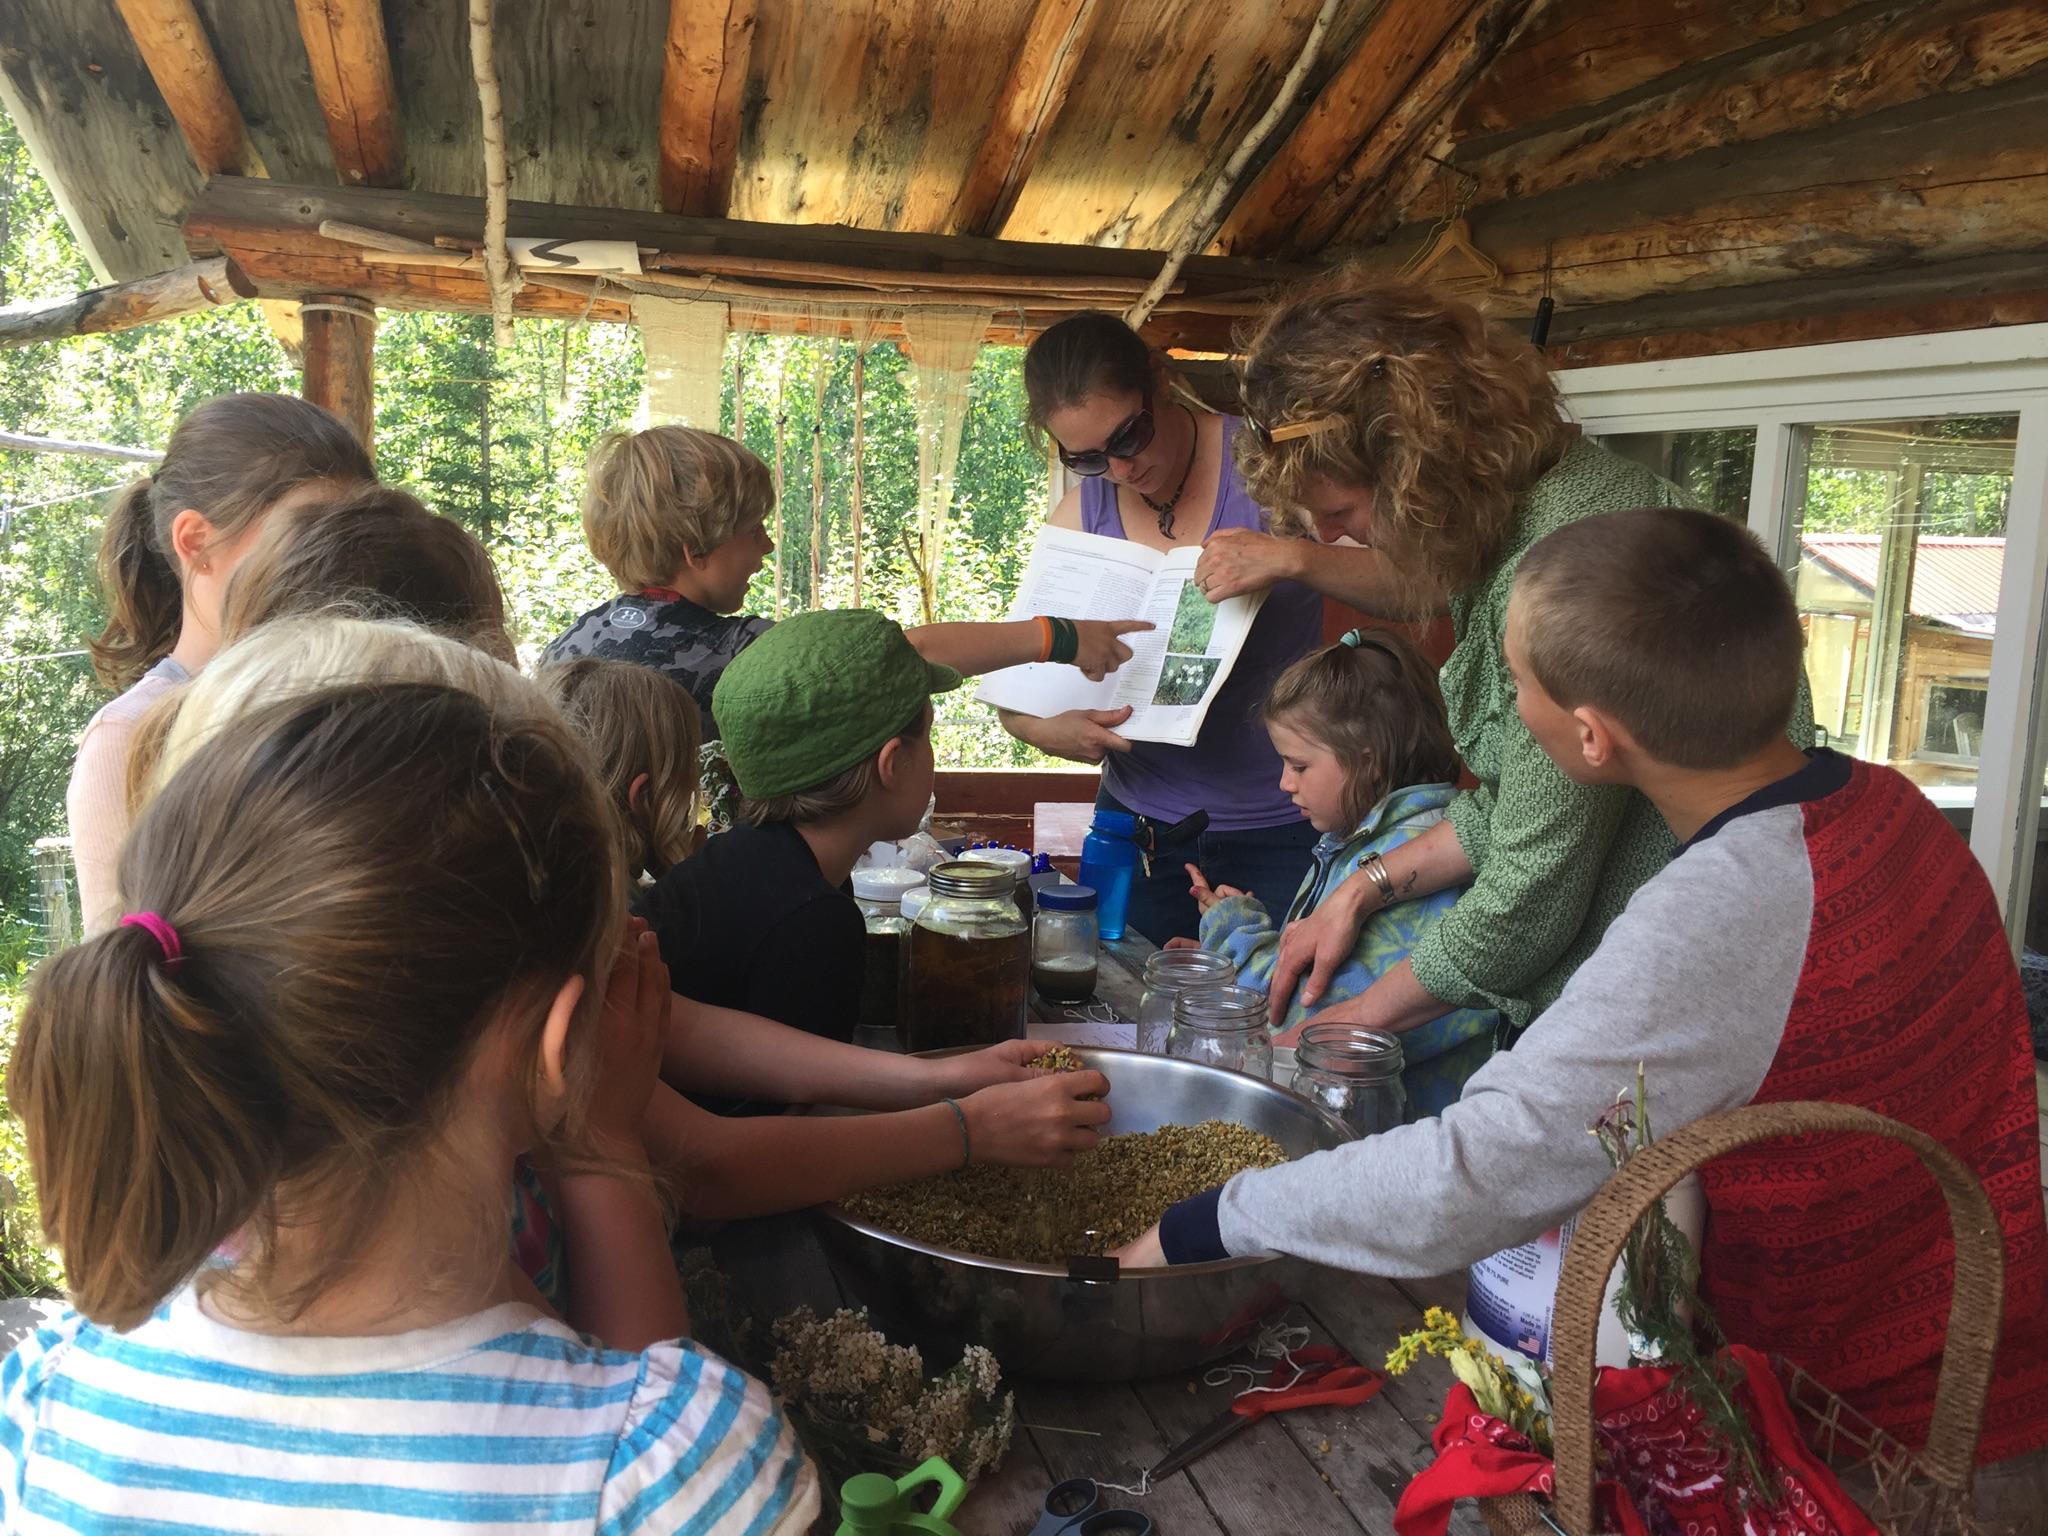 2017 Mountain Arts & Science for Youth - Photo: Lara Applebaum